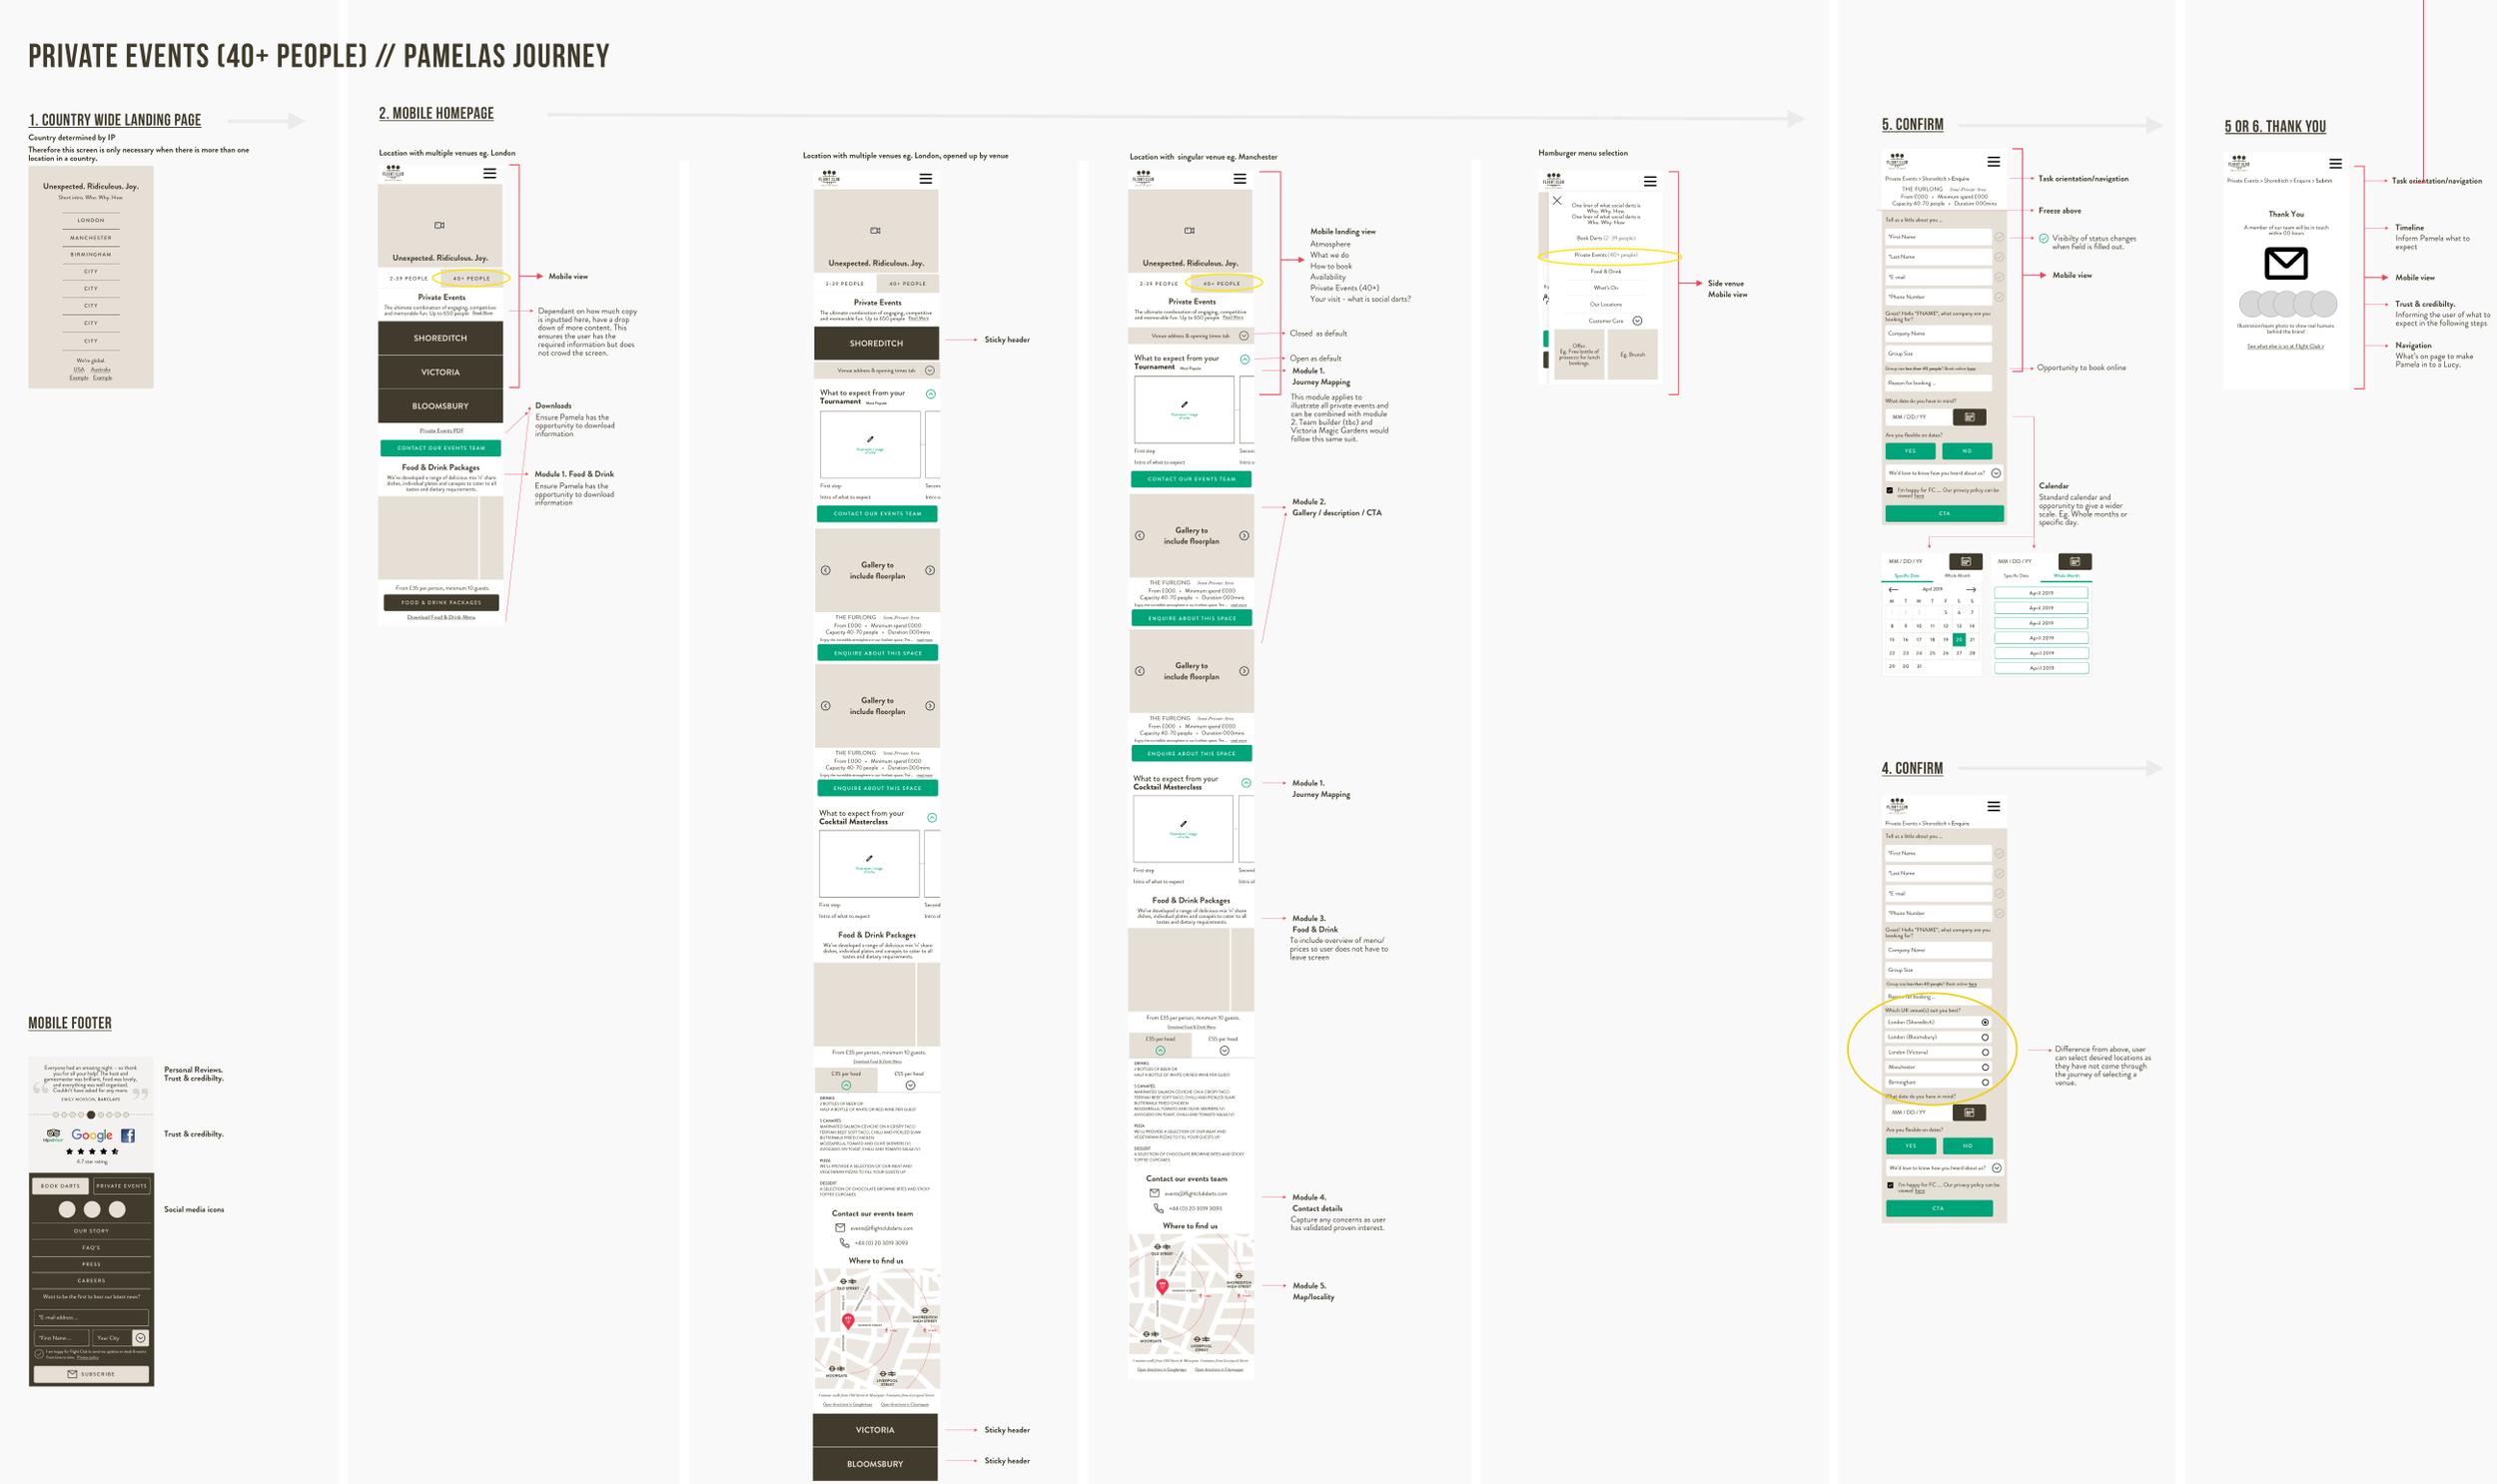 laurengracedesign-freelance-ux-designer-consultant-flight-club-darts-wireframes-version-2-private-events.png